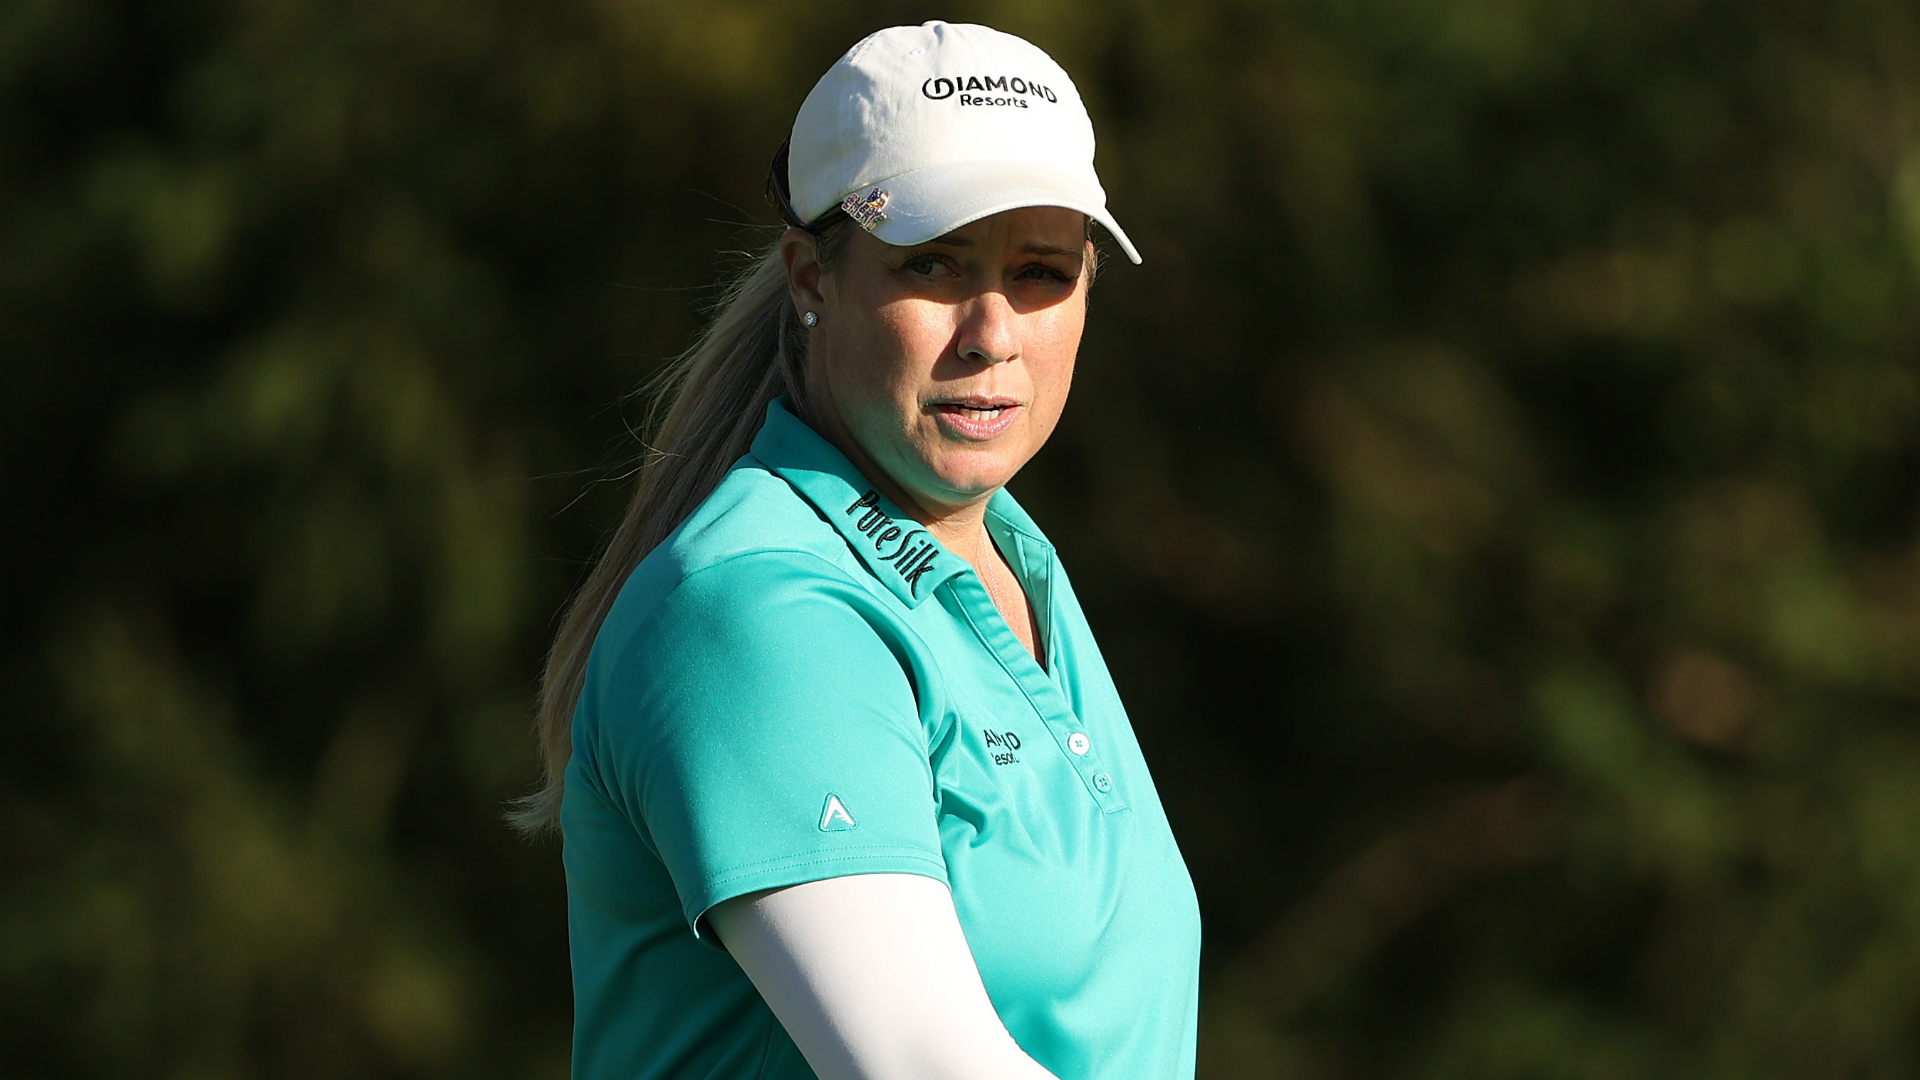 Lincicome and Tan share Women's PGA Championship lead